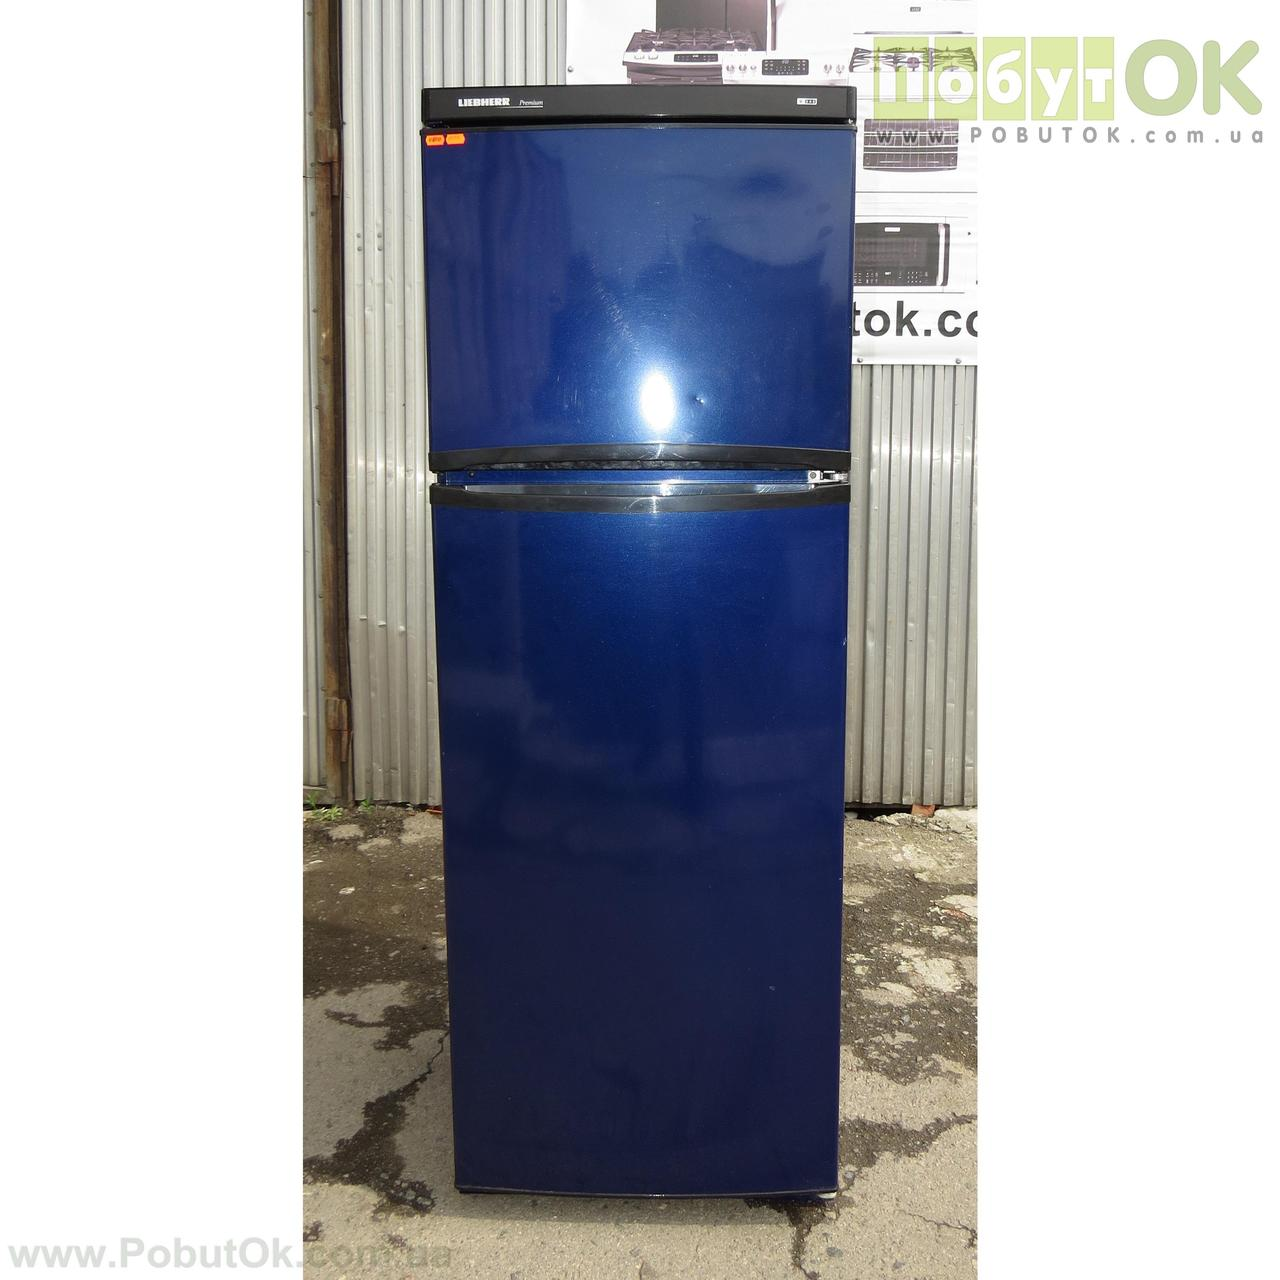 Холодильник LIEBHERR KDbl 3142 Index 24 / 001 (Код:1797) Состояние: Б/У